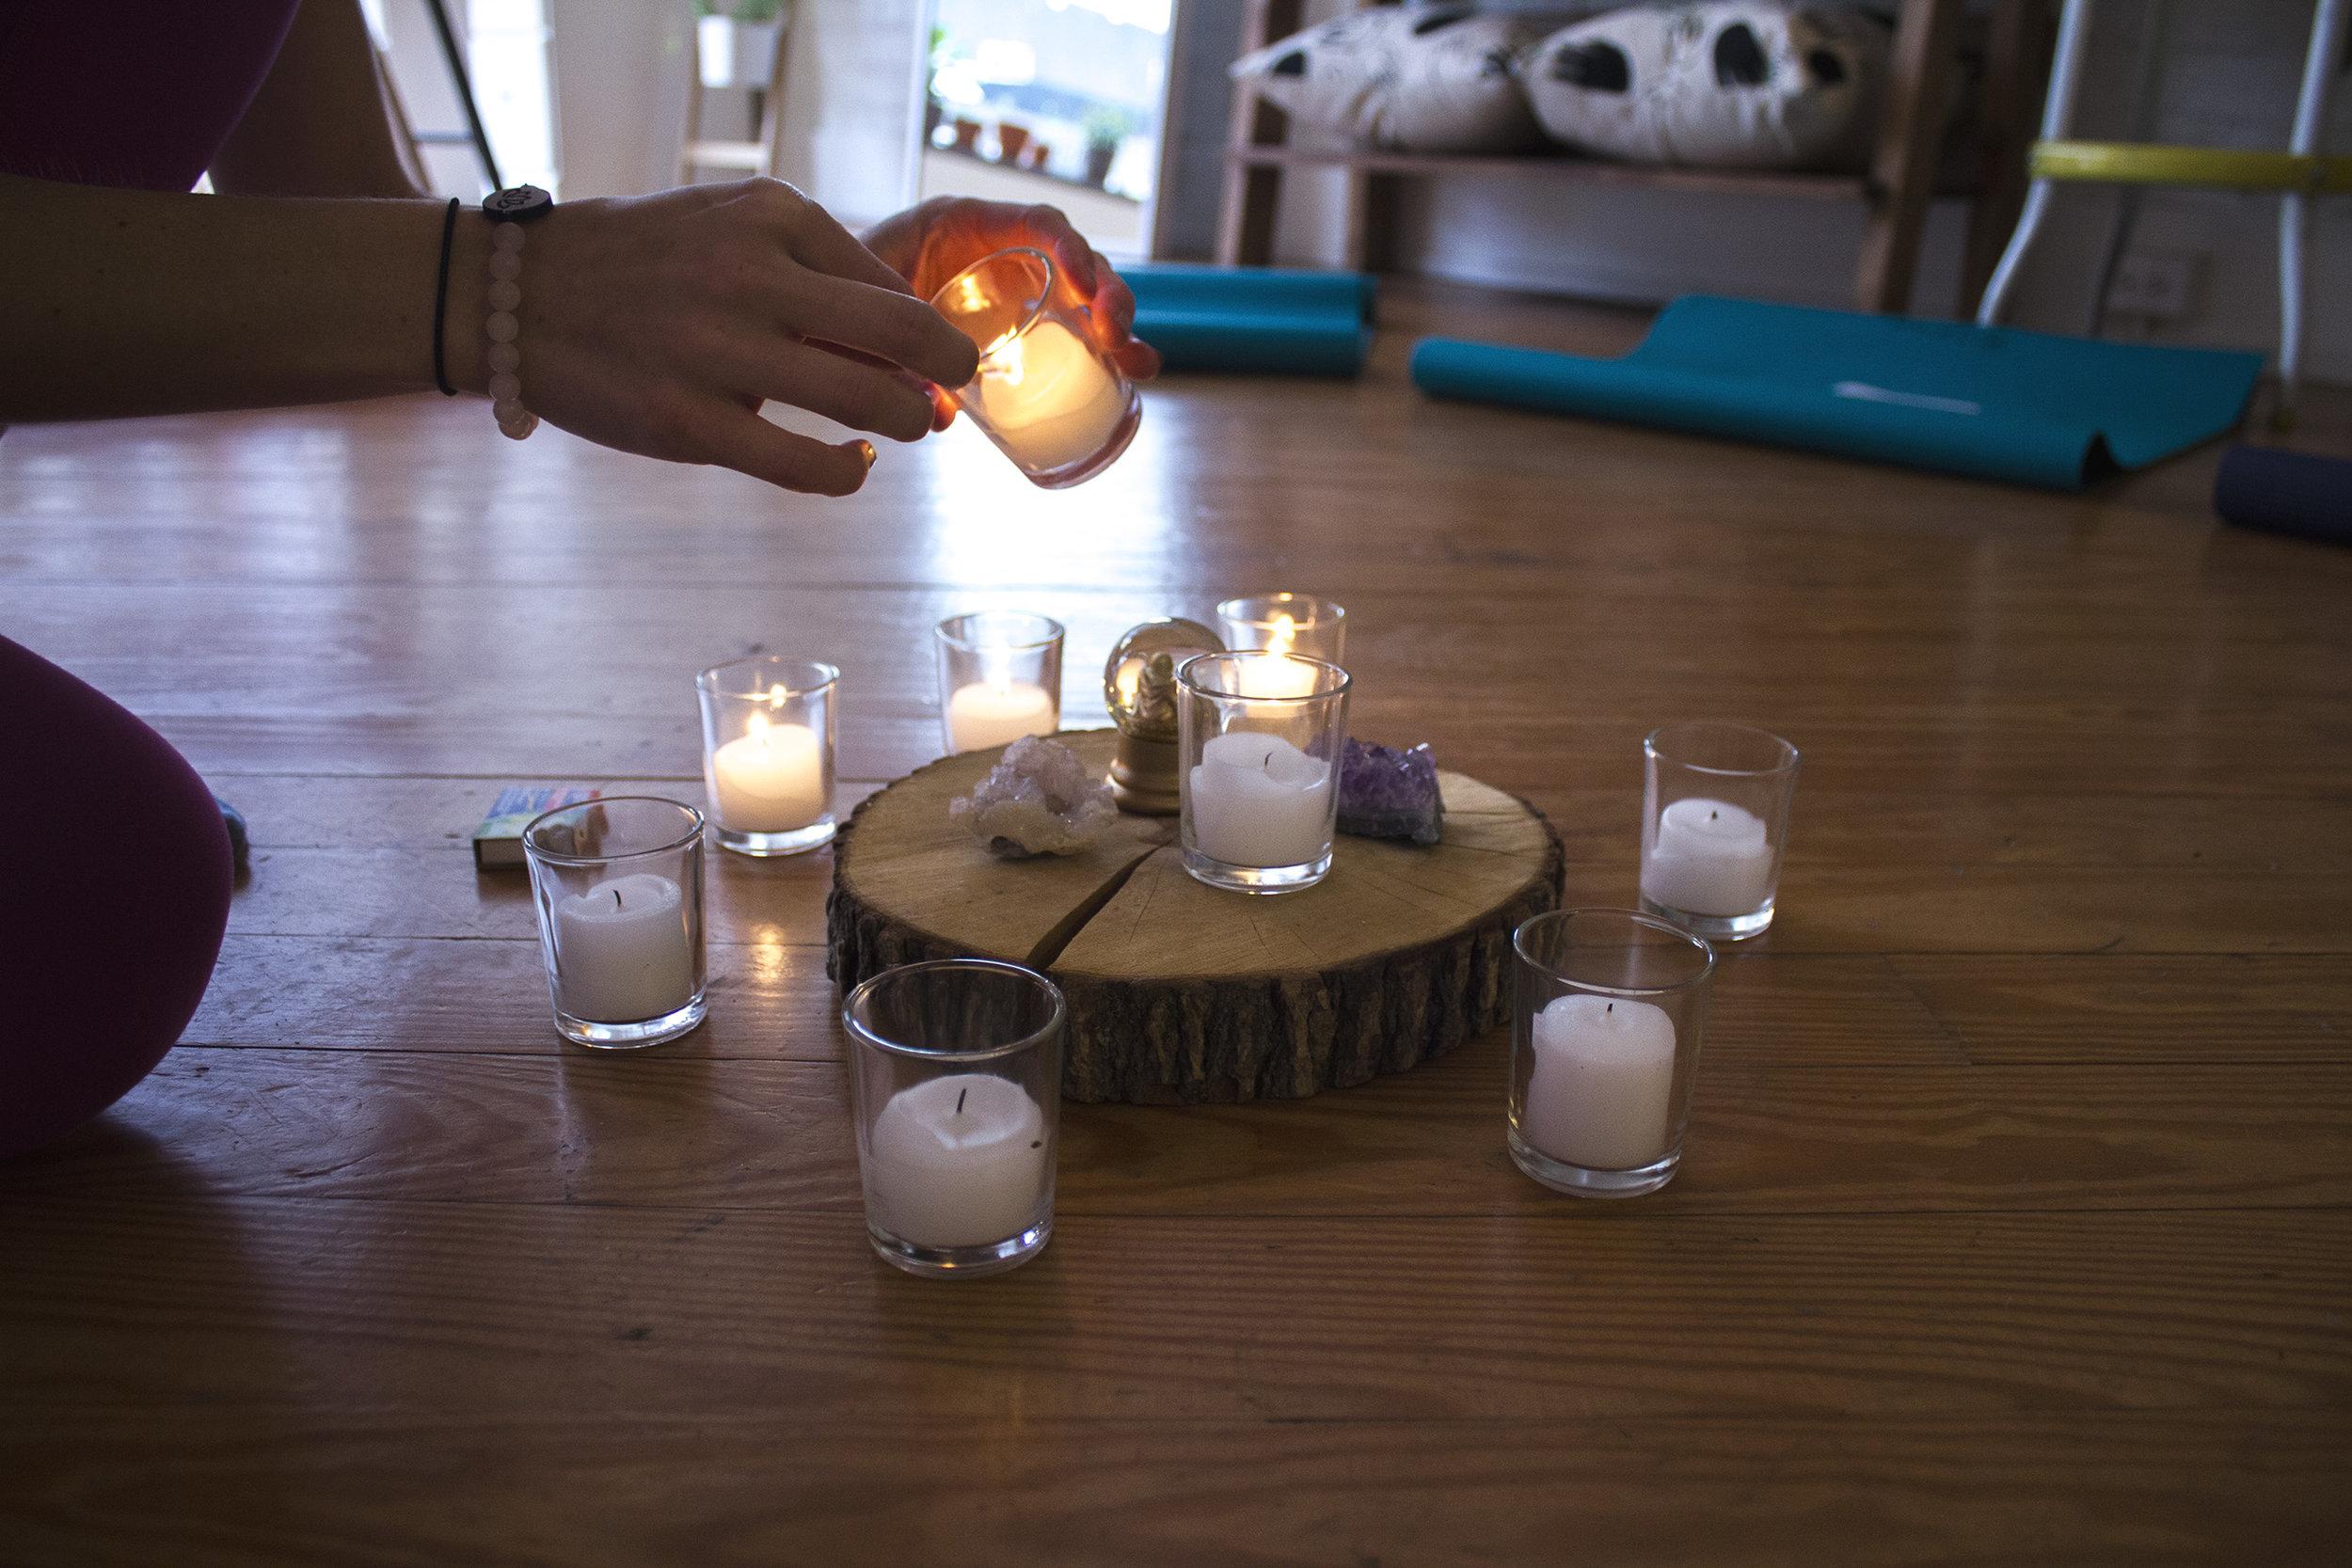 We had meditation workshops with our friend, Mija!